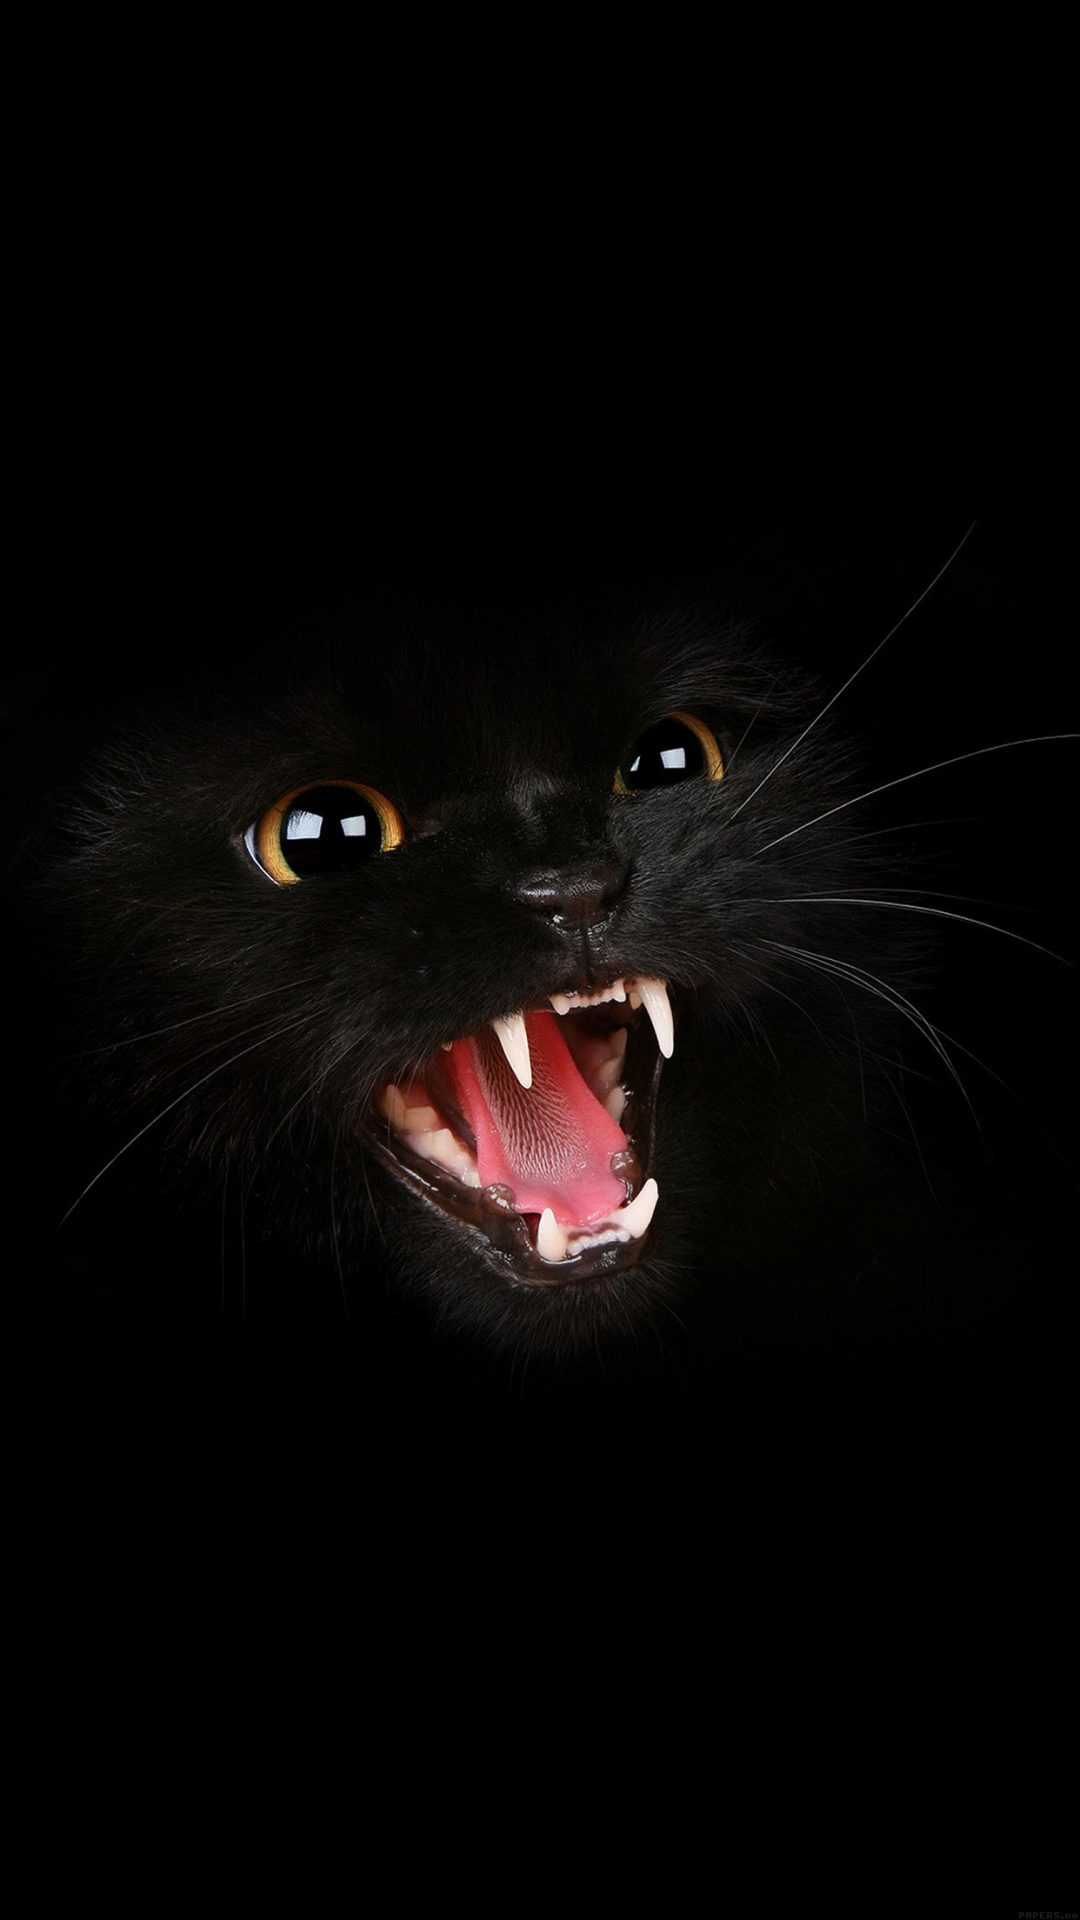 Black Cat Roar Animal Cute